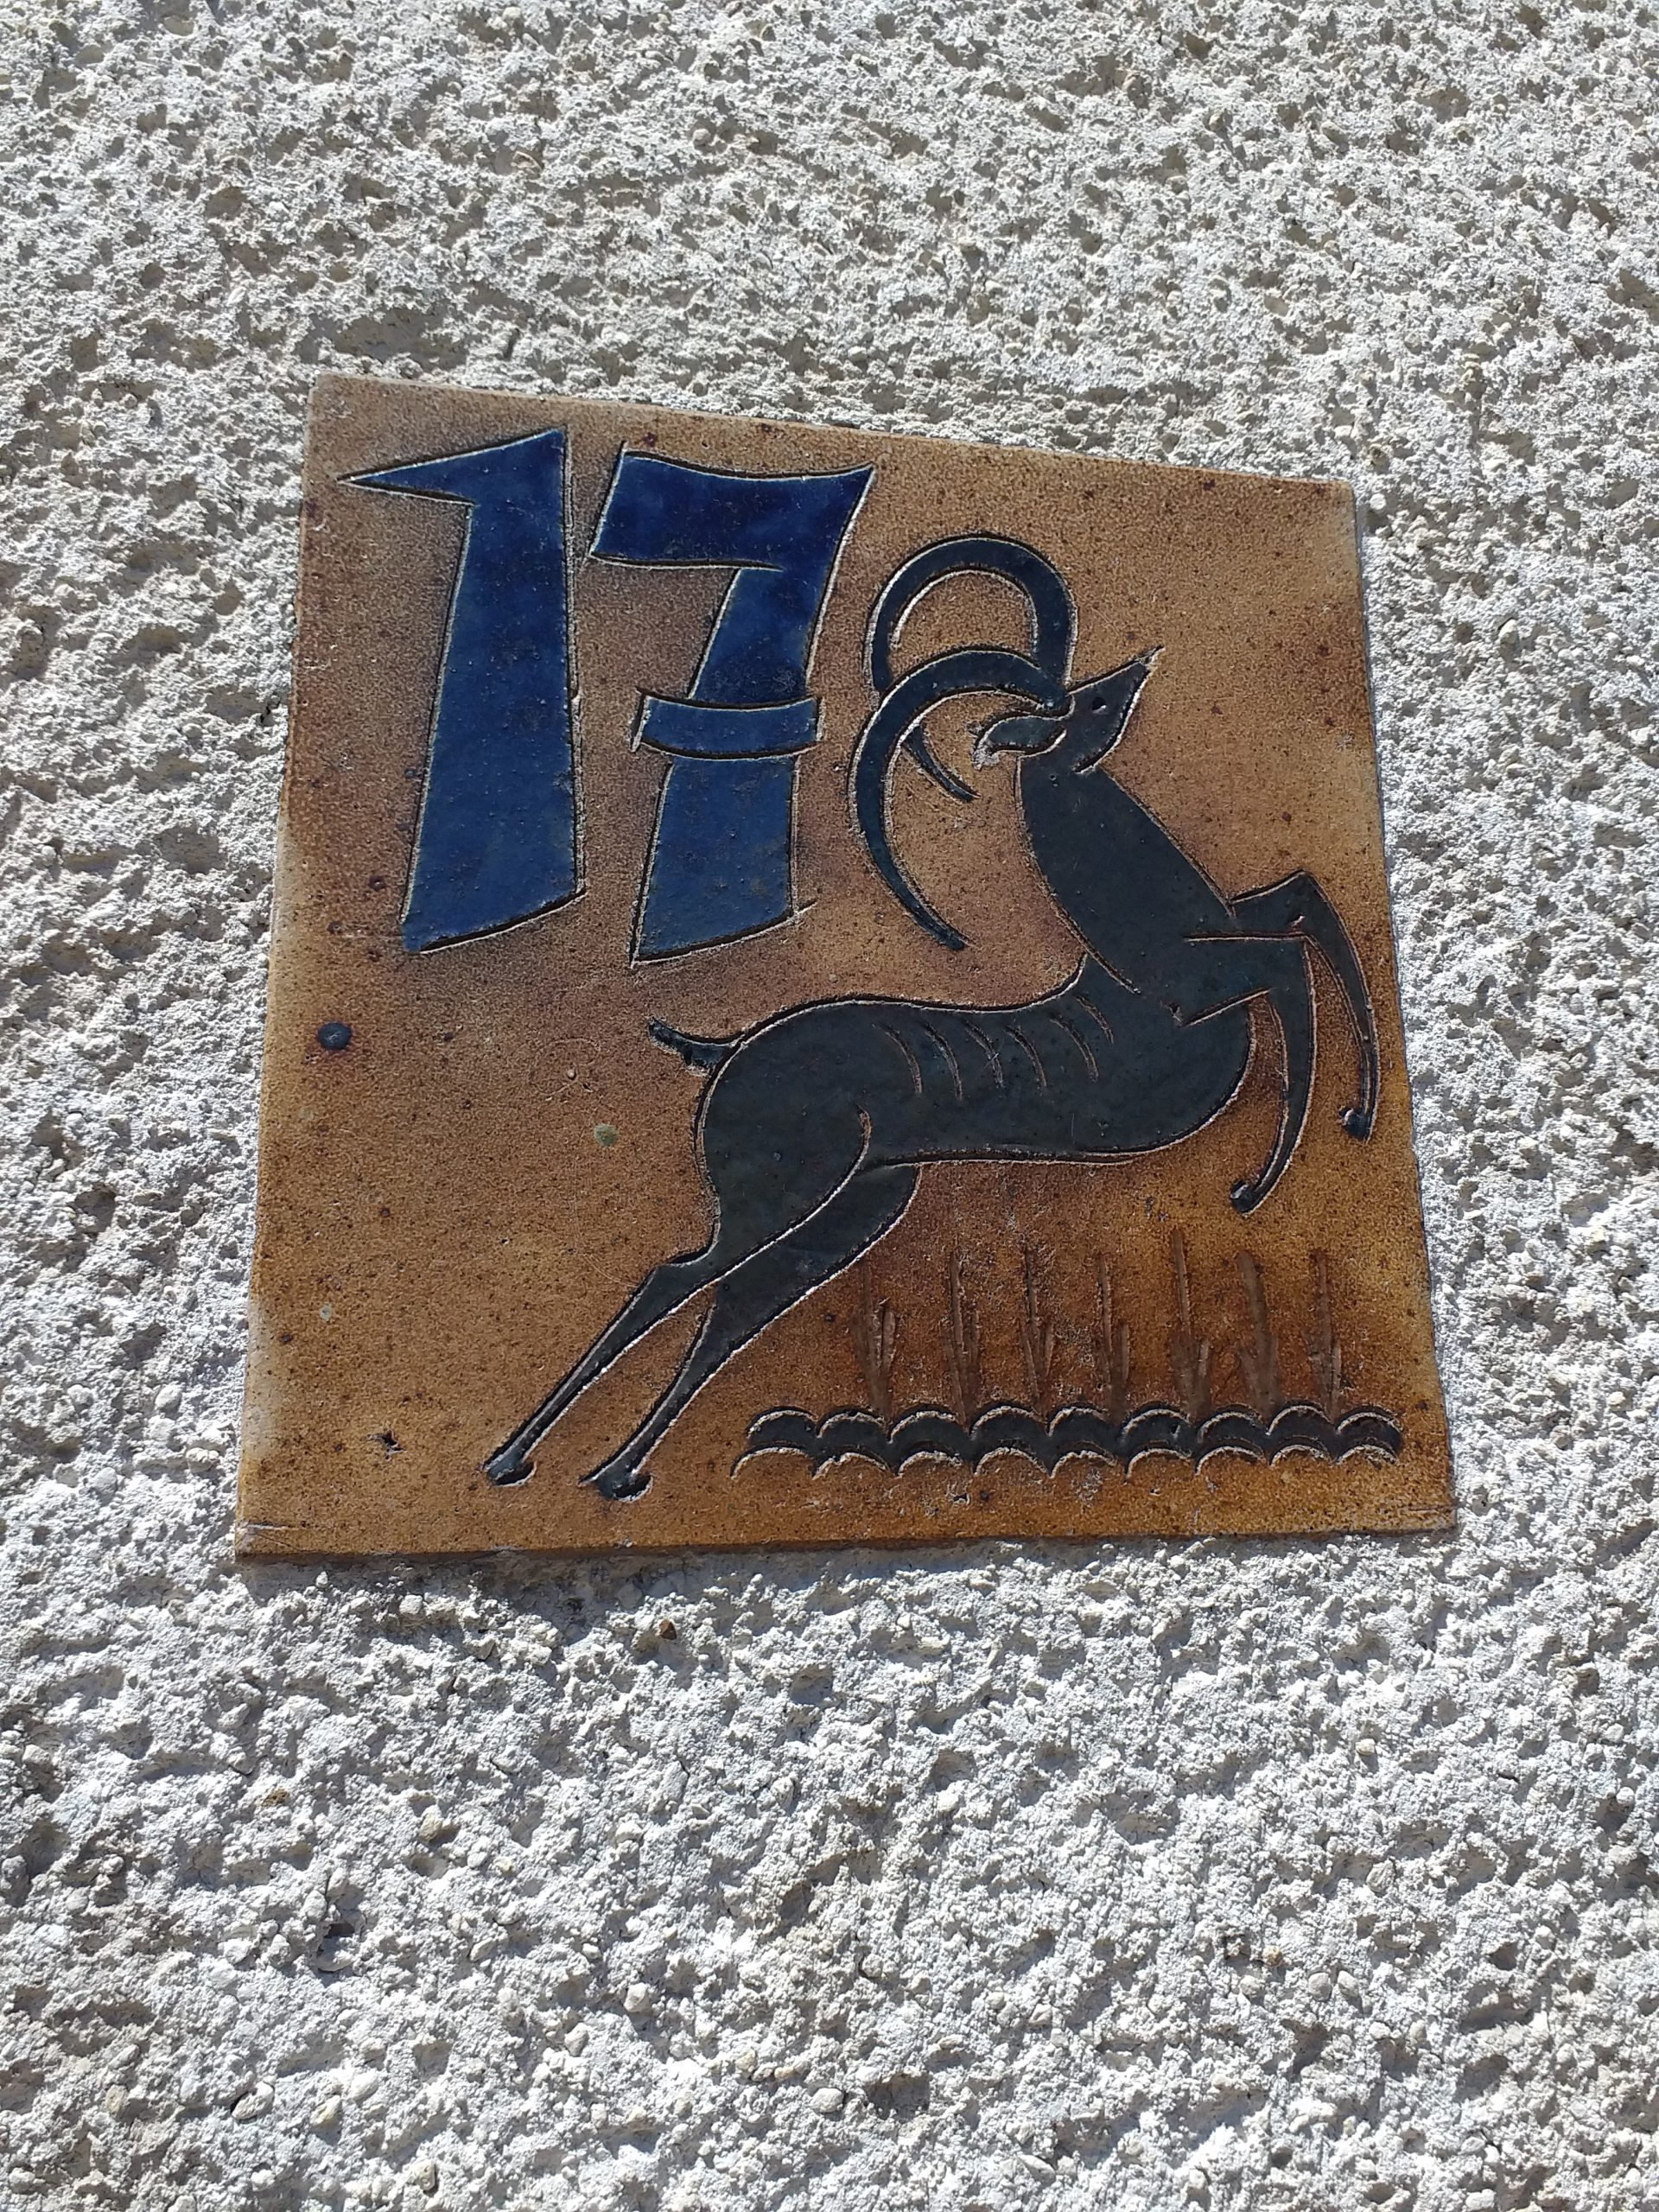 Rätsel um historische Hausnummern Moltkestraße 3-19 gelöst!